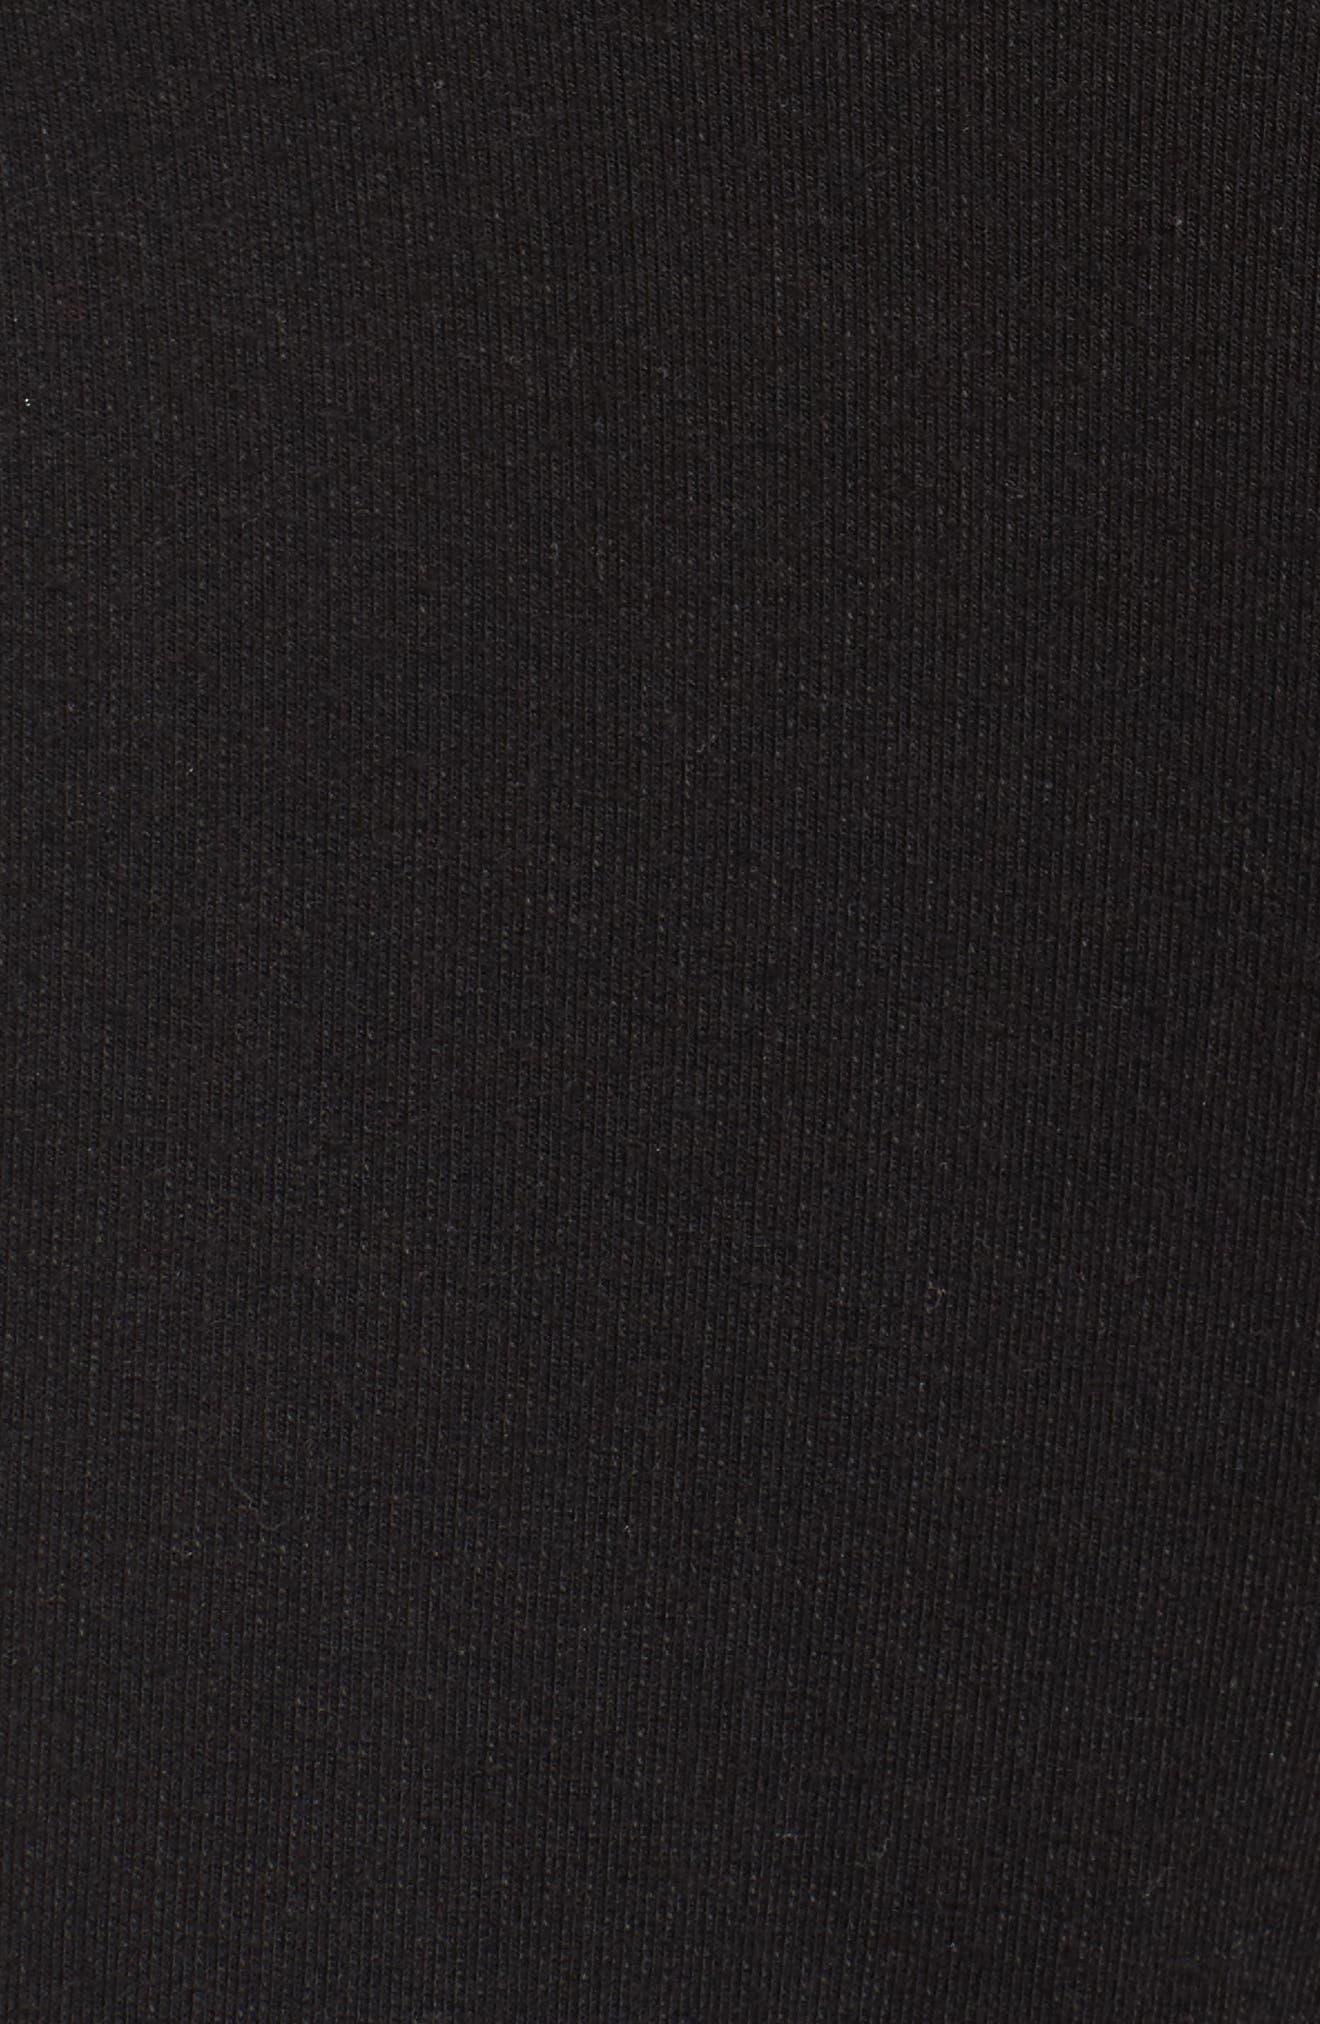 FP Movement Agile Pants,                             Alternate thumbnail 6, color,                             001